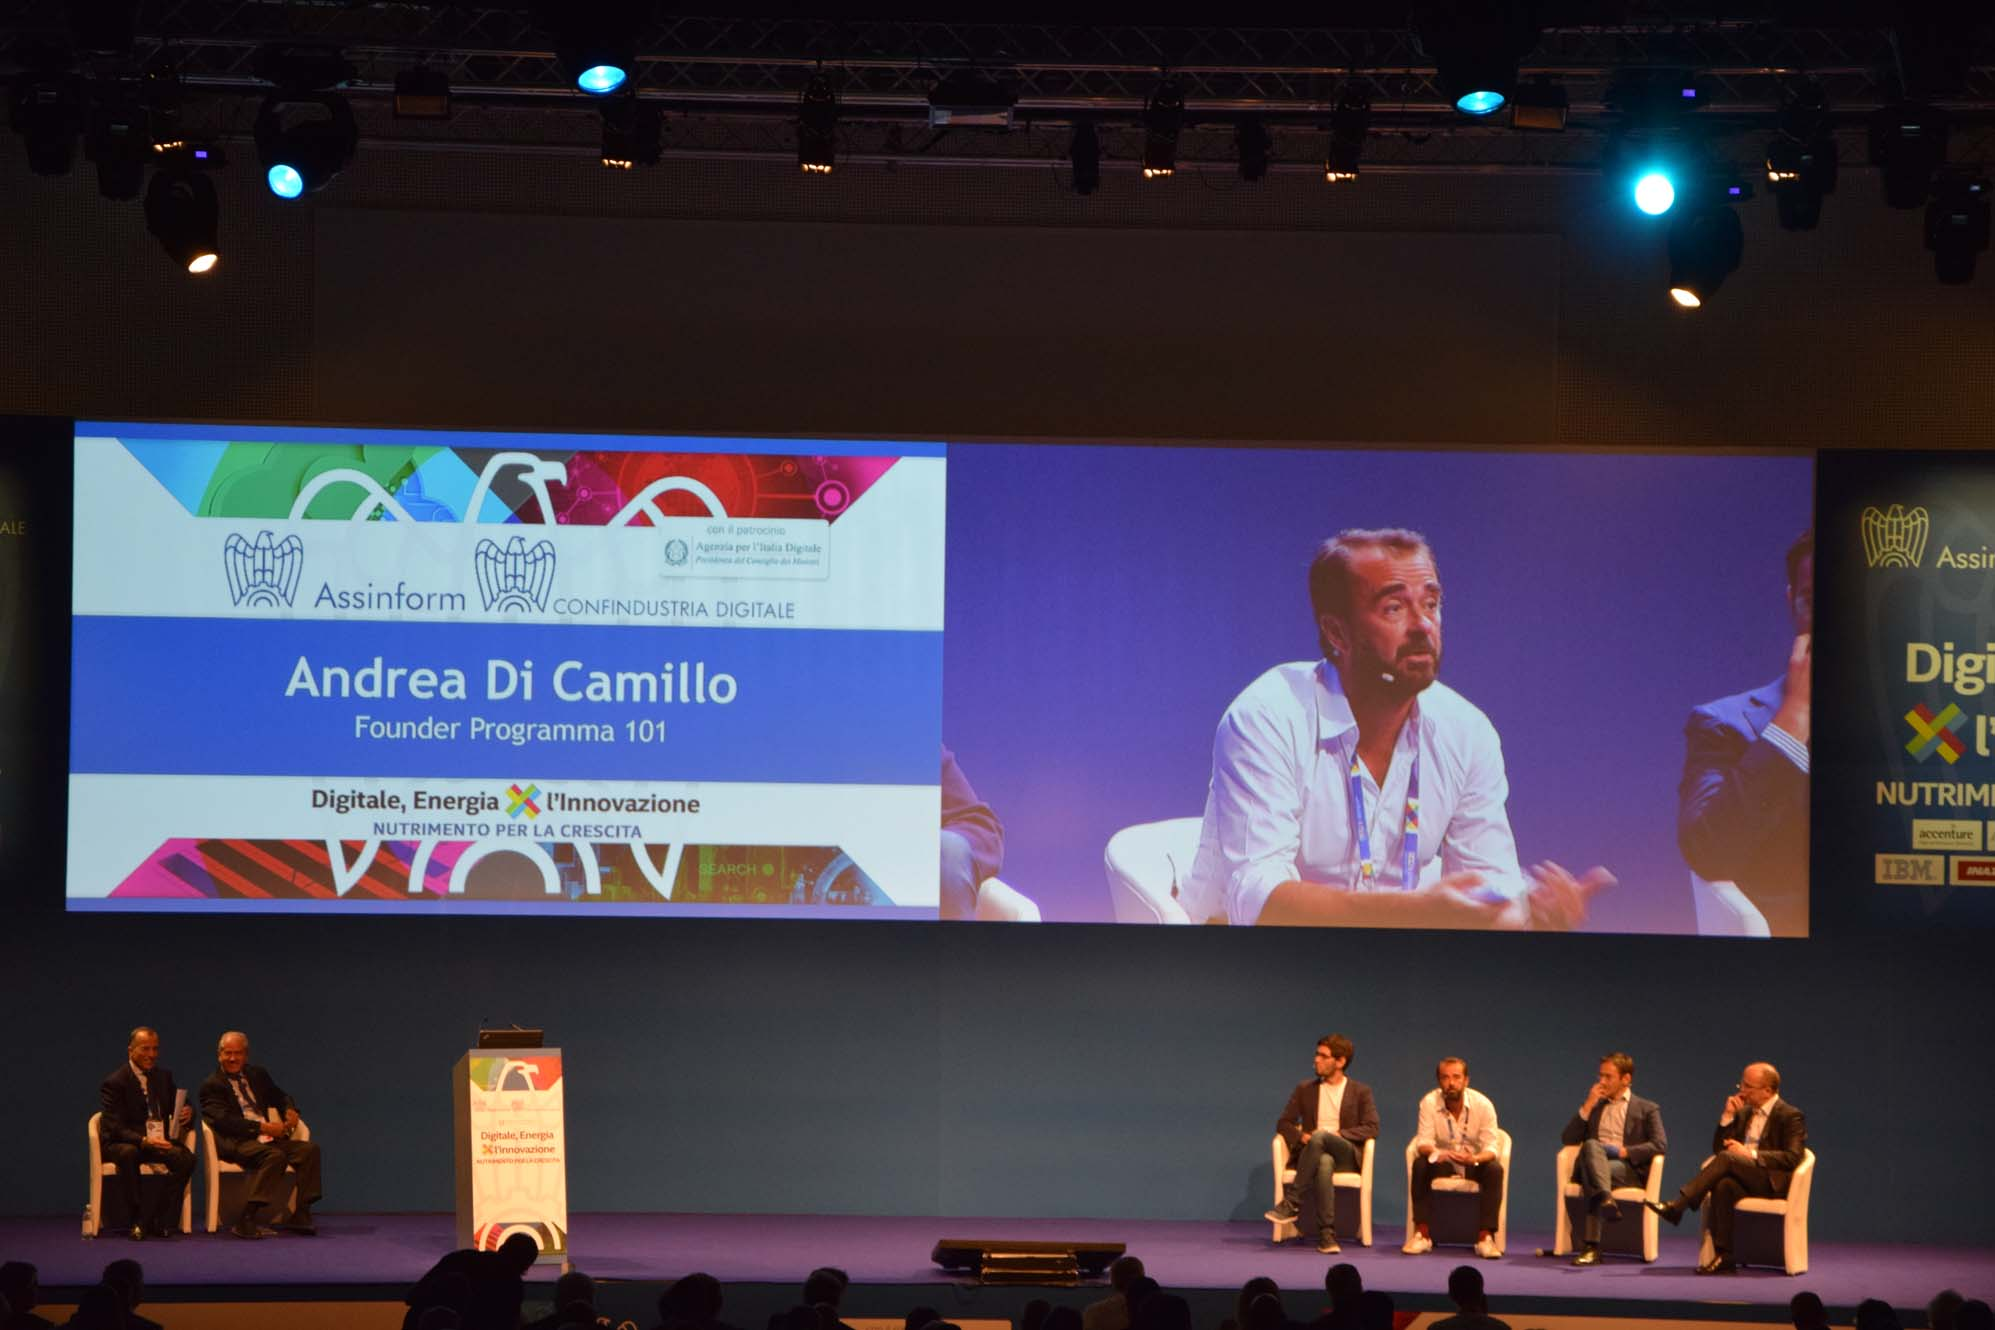 Convegno Assinform Expo 2015